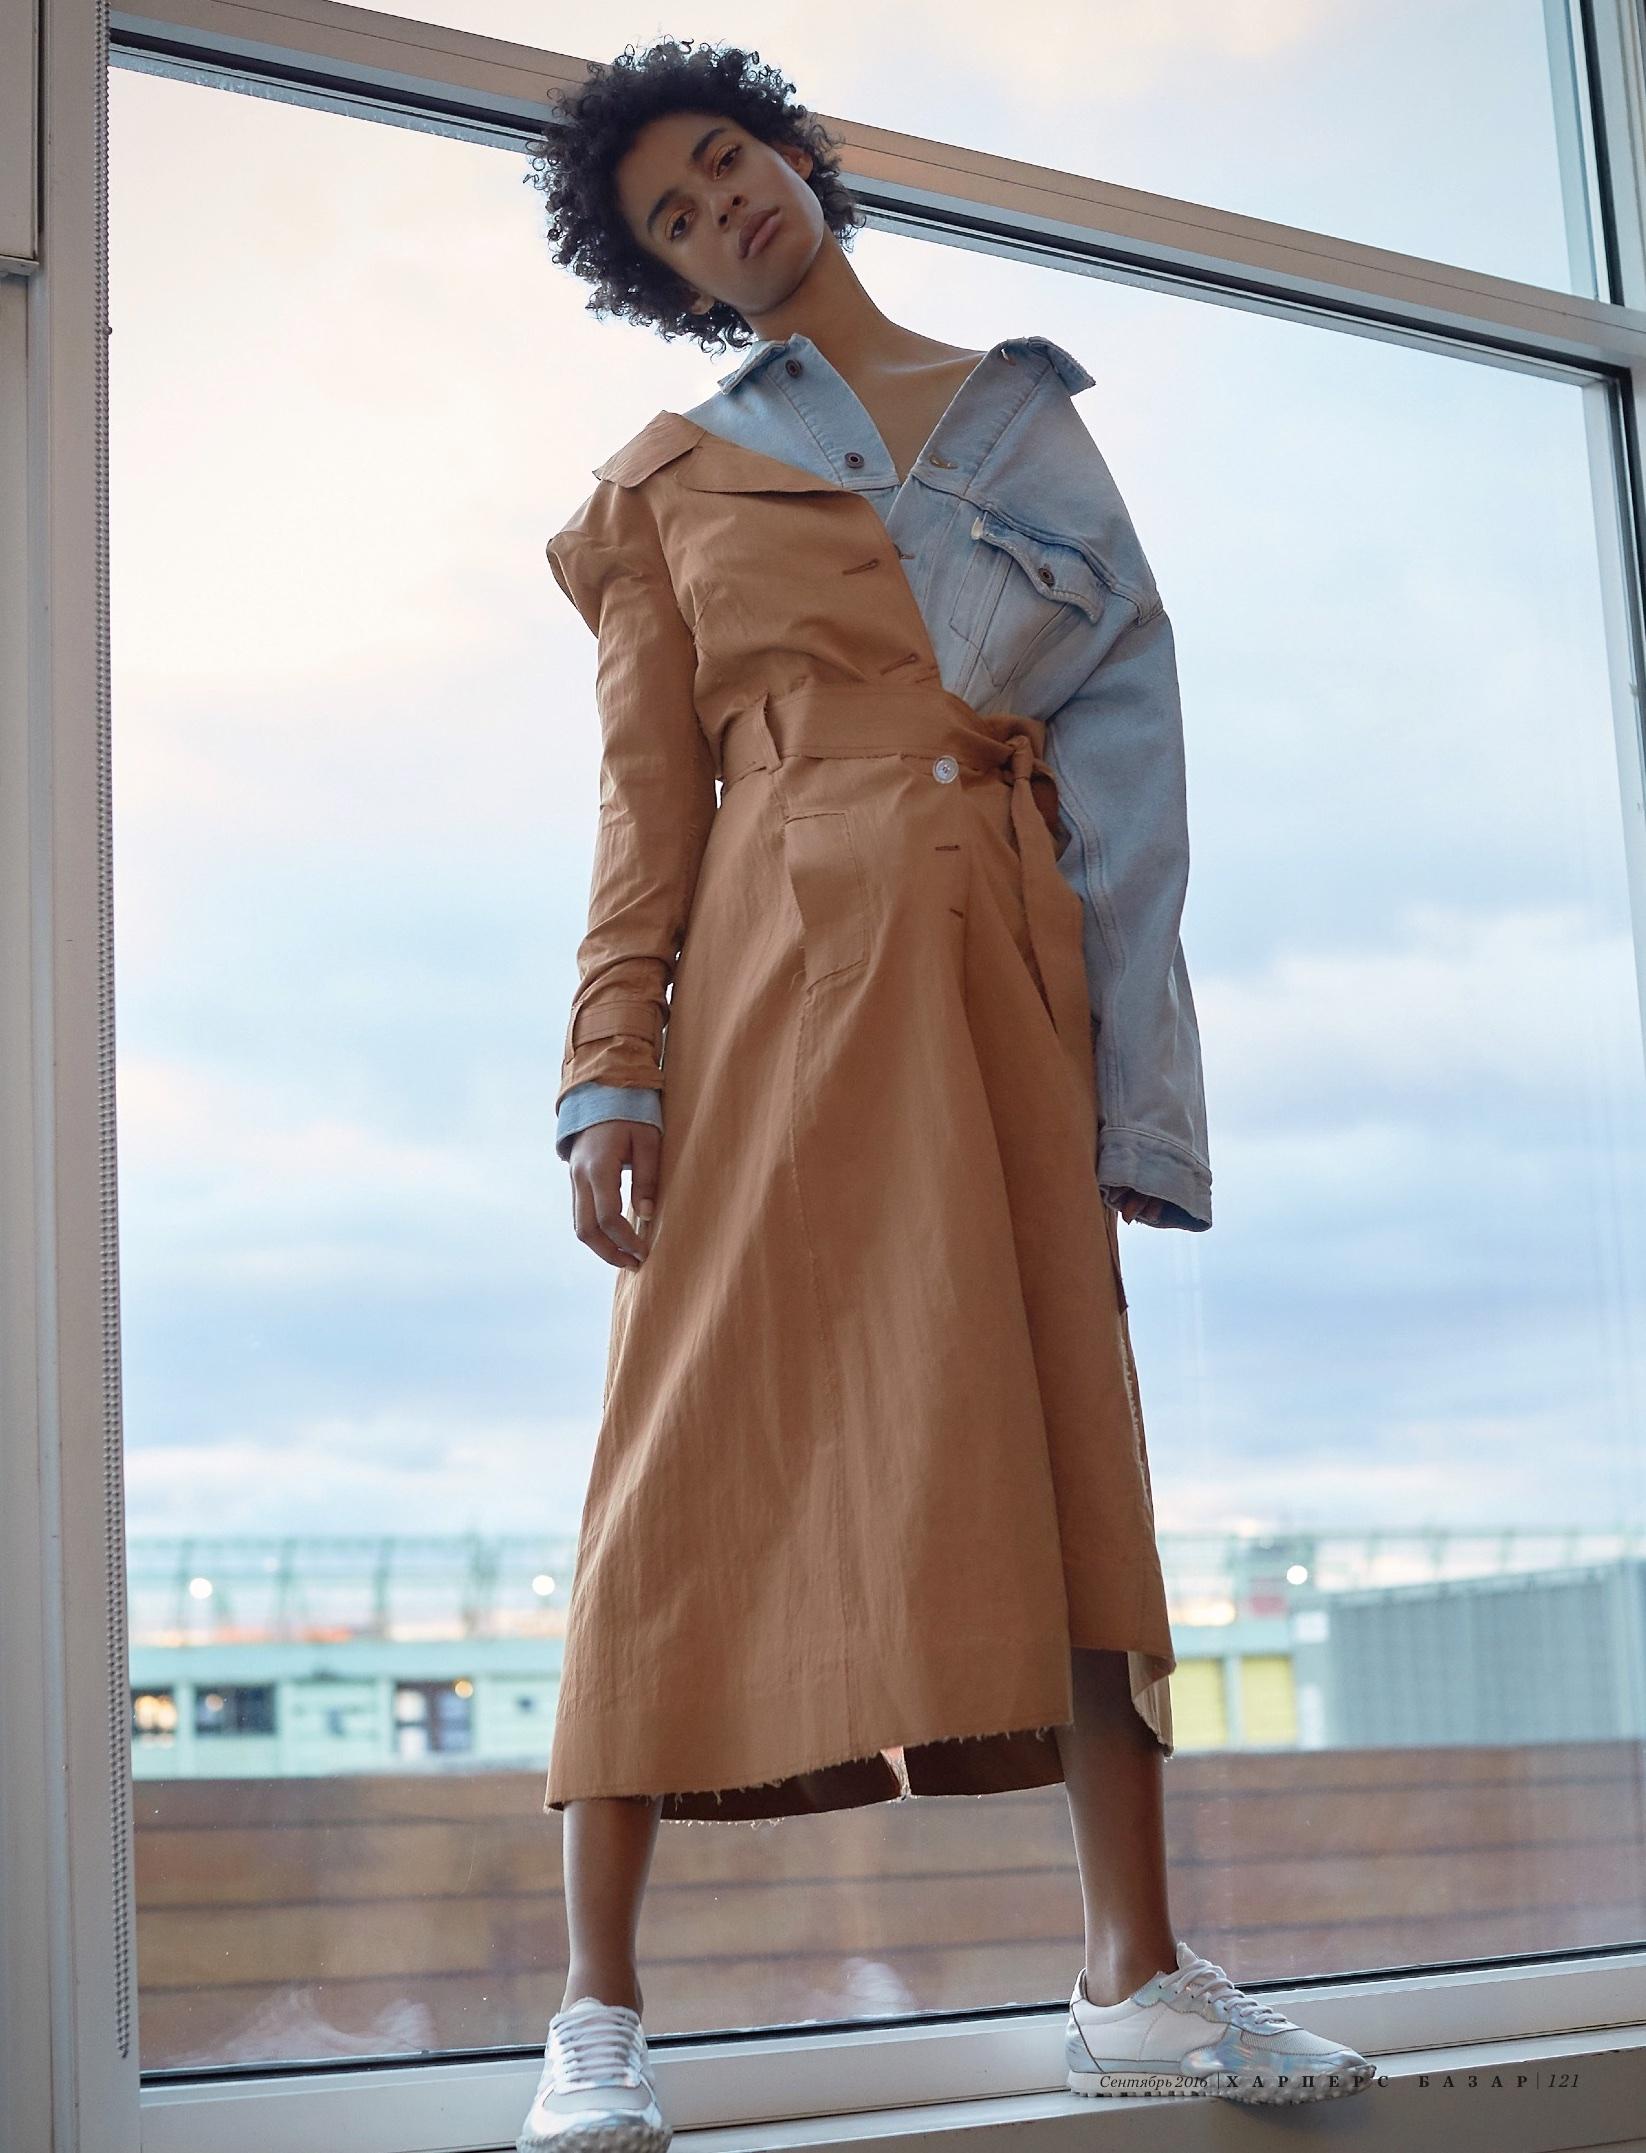 Off White VIrgil Abloh feature Harpers Bazaar KZ  Dimitri Hyacinthe